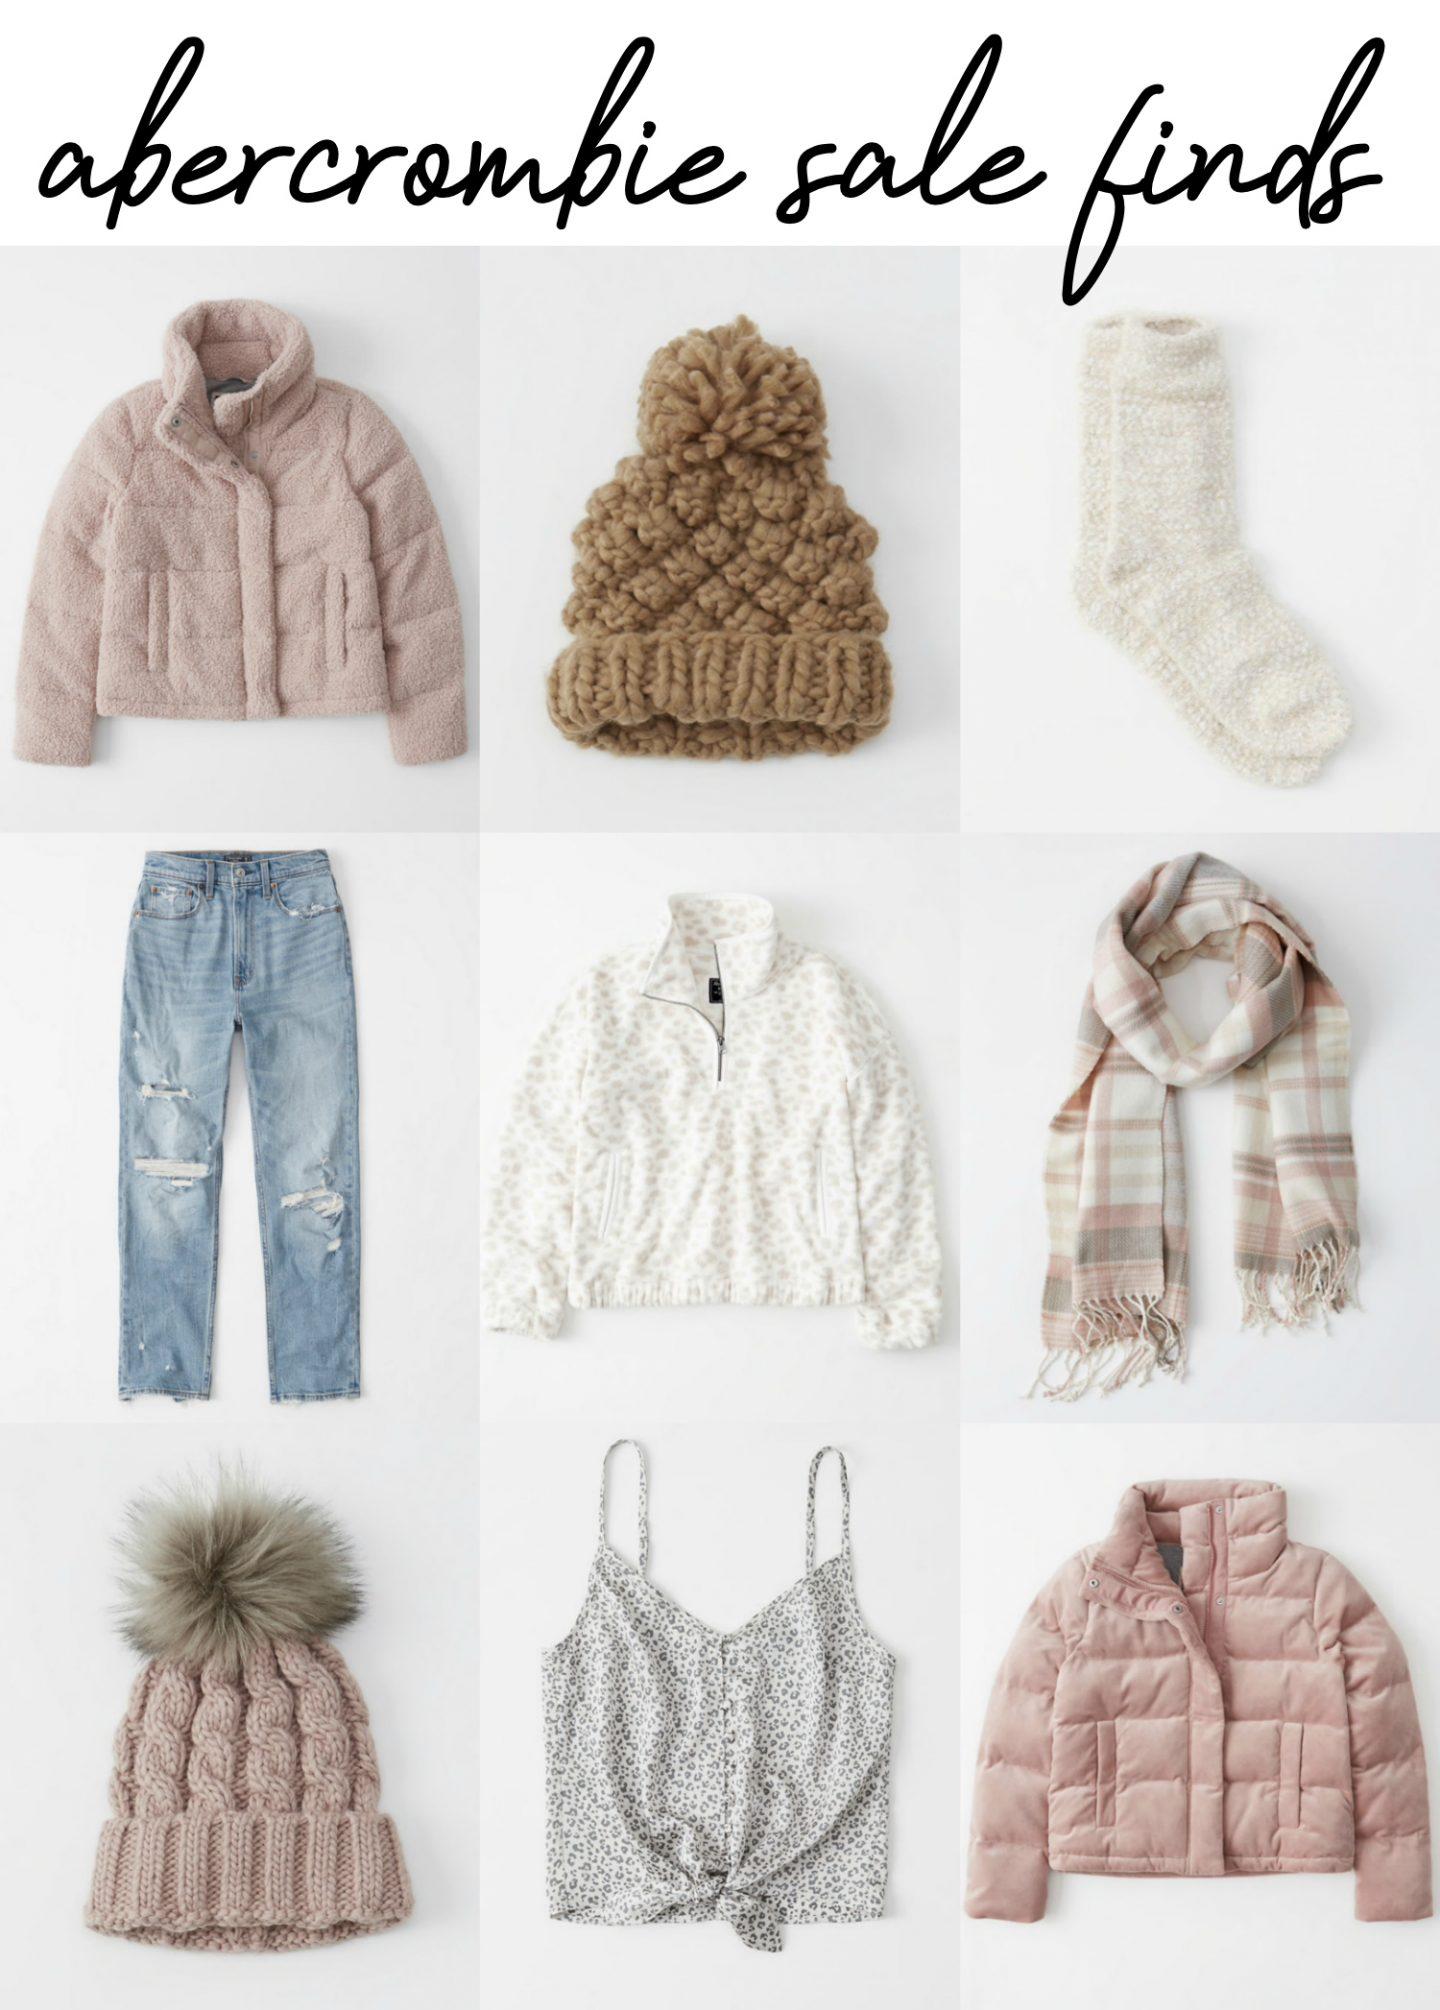 abercrombie sale | abercrombie cyber monday | beanie | mash Elle beauty blogger | socks